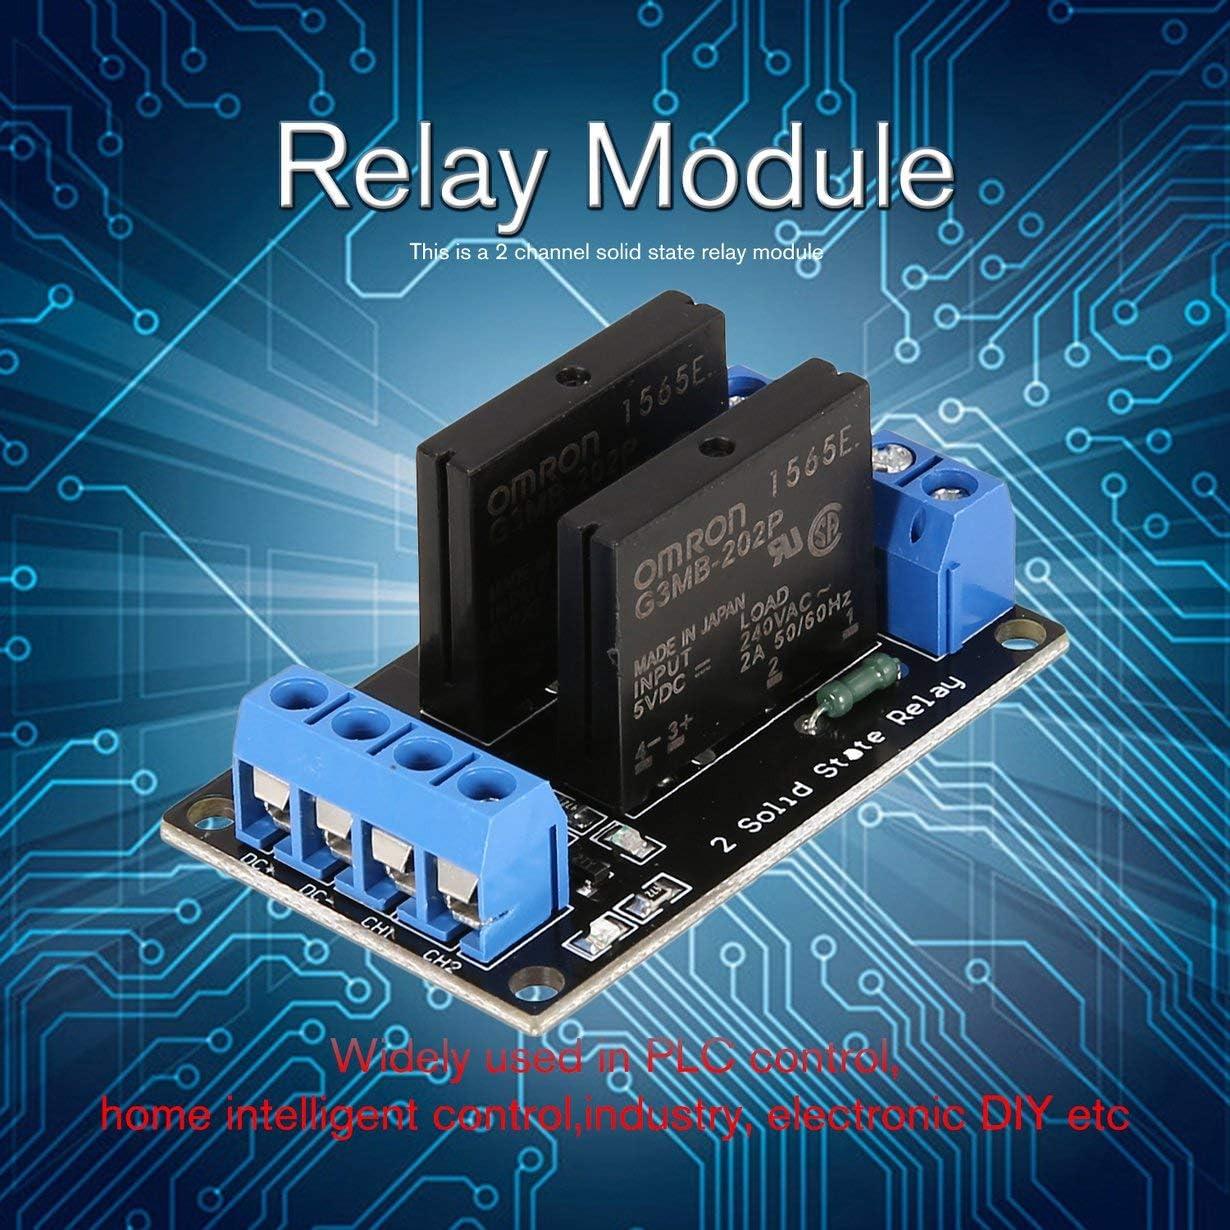 Blau /& Schwarz 2 Kanal Solid State Relay Modulplatine Low Level Trigger SSR Eingang 5V DC Ausgang 240V AC 2A Sicherung PLC Controller